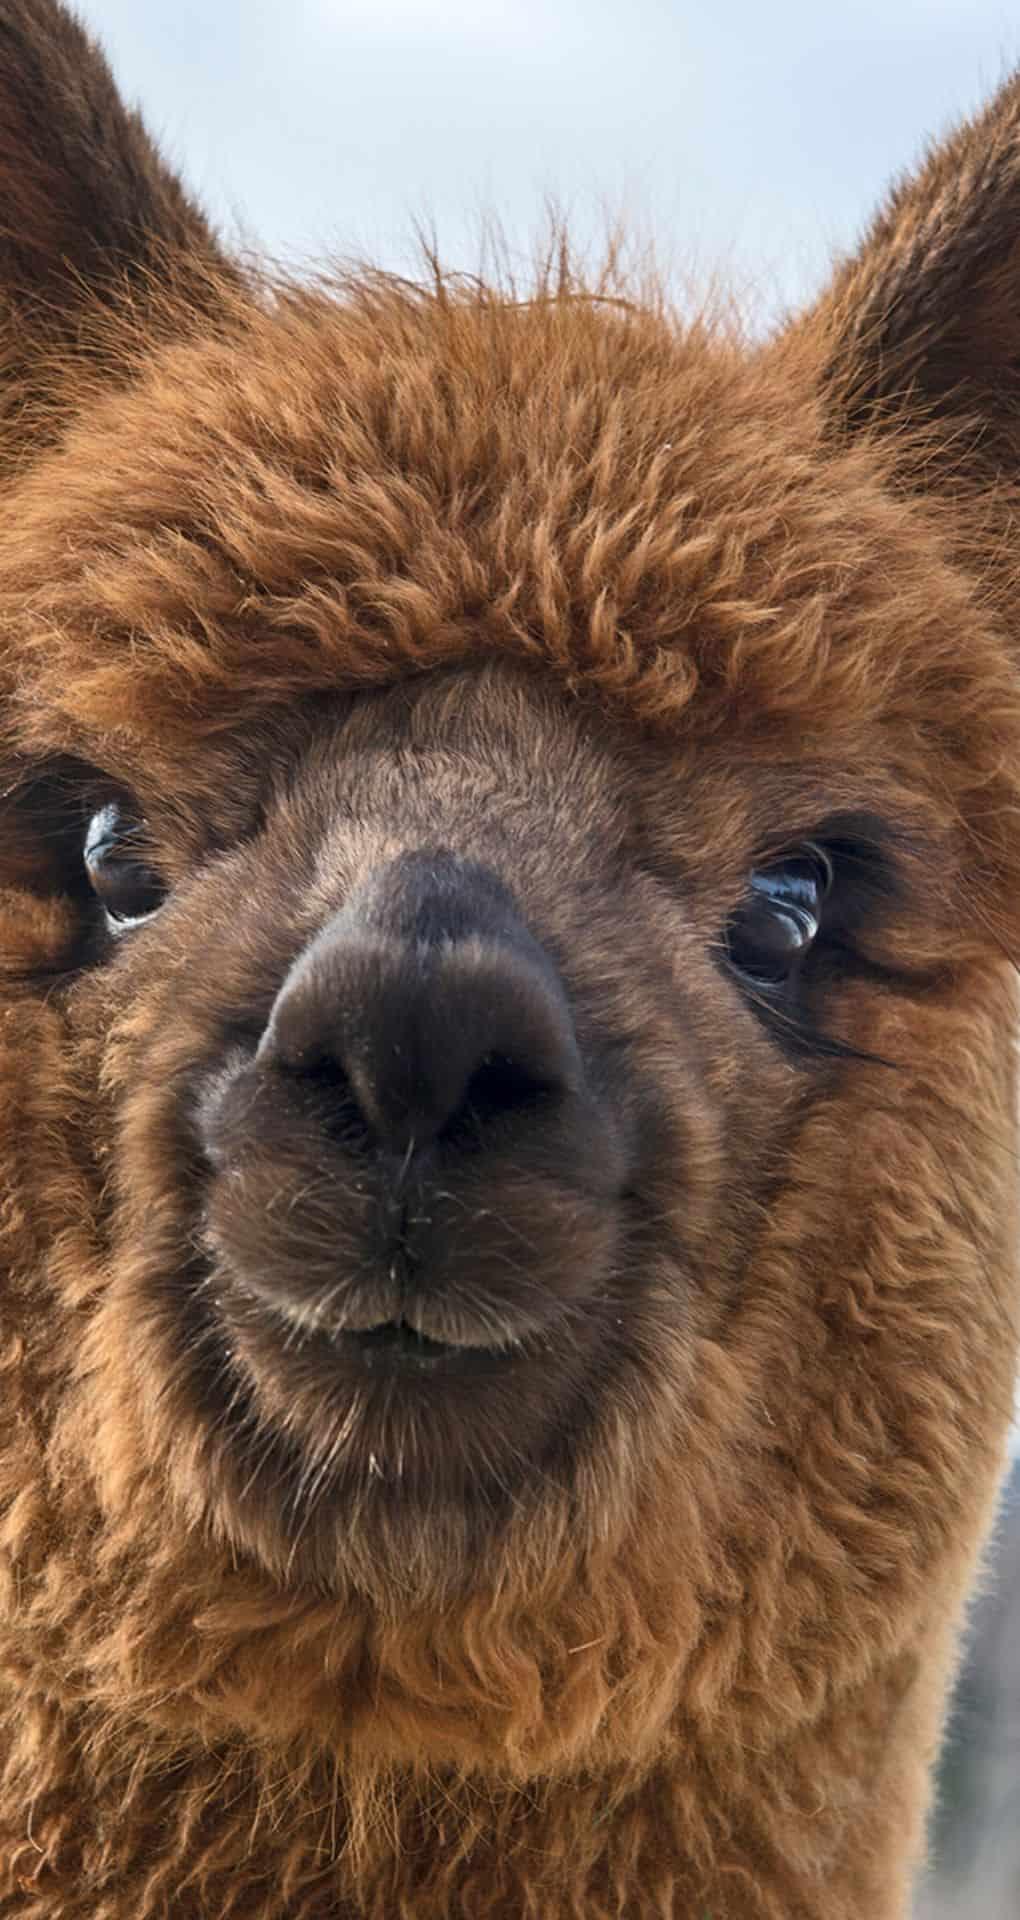 cute iPhone wallpaper with an alpaca